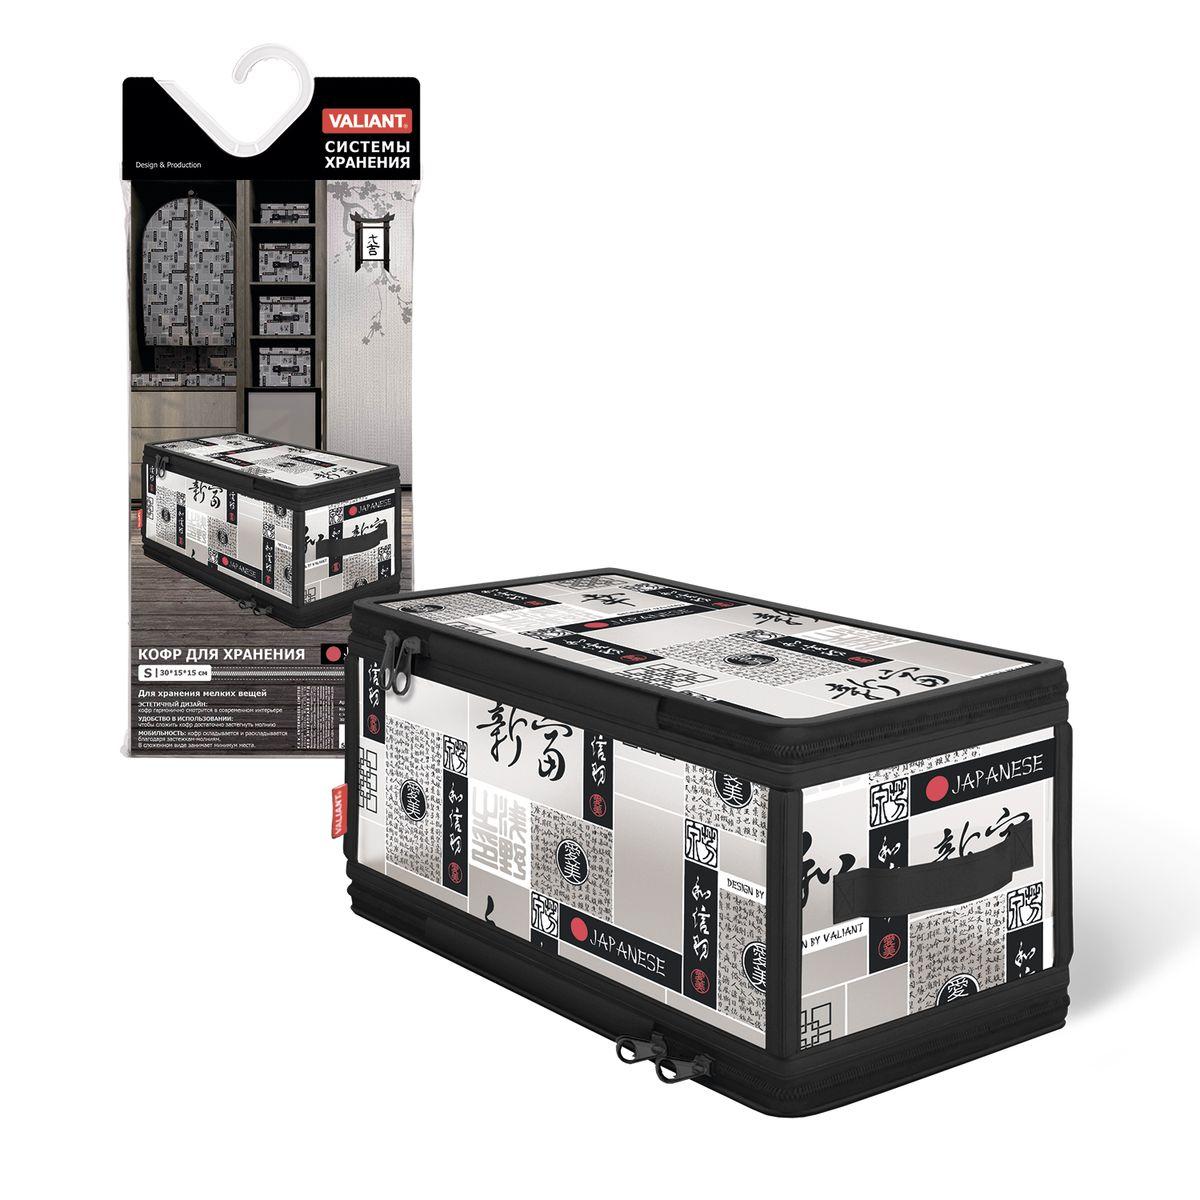 Кофр для хранения Valiant Japanese Black, с застежкой-молнией, 30 х 15 х 15 смJB-ZIP-S